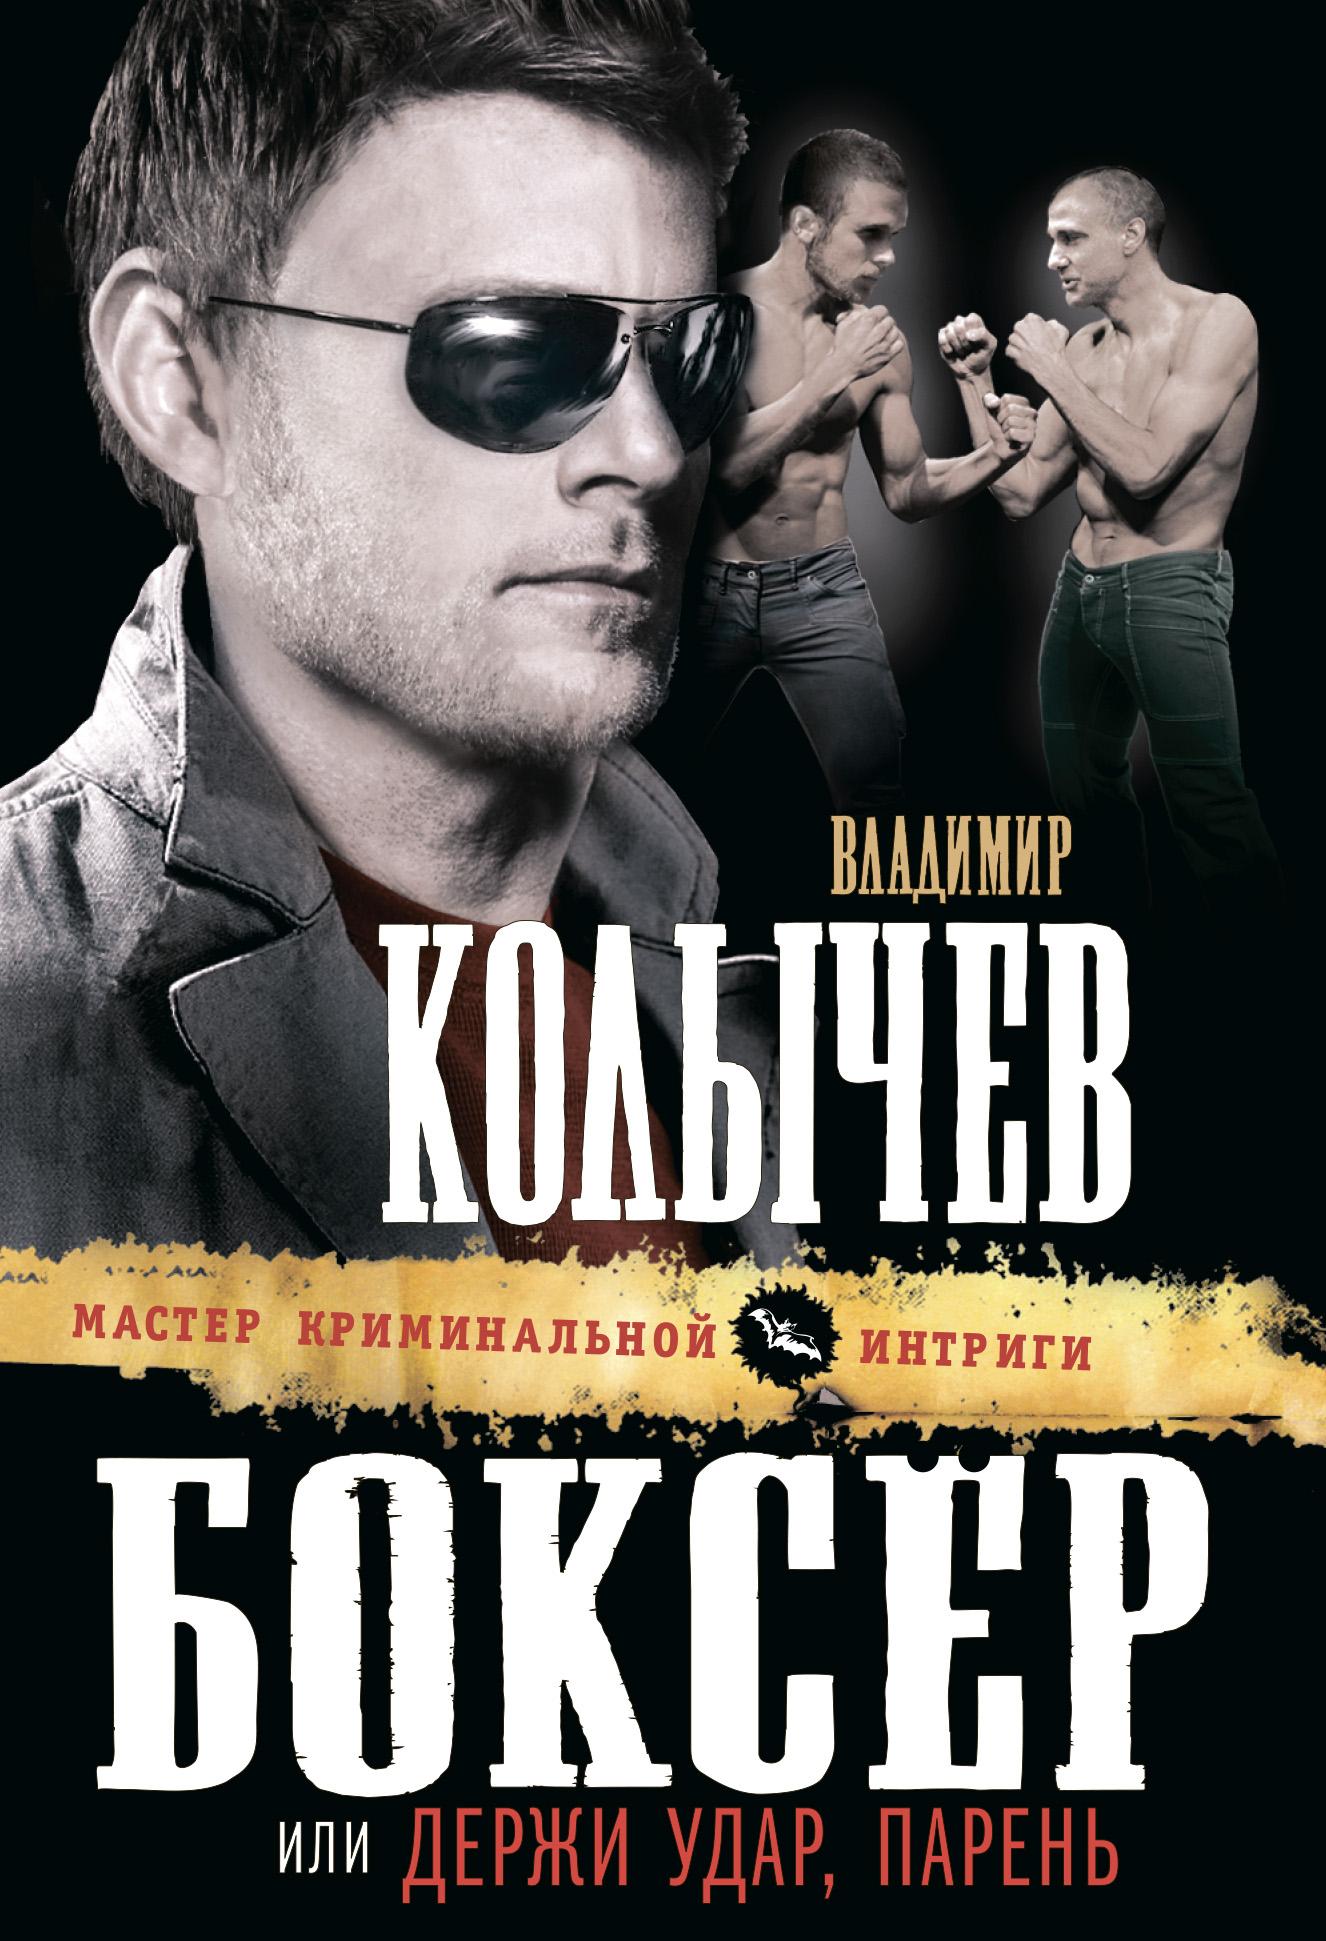 Владимир Колычев Боксер, или Держи удар, парень владимир колычев боксер или держи удар парень